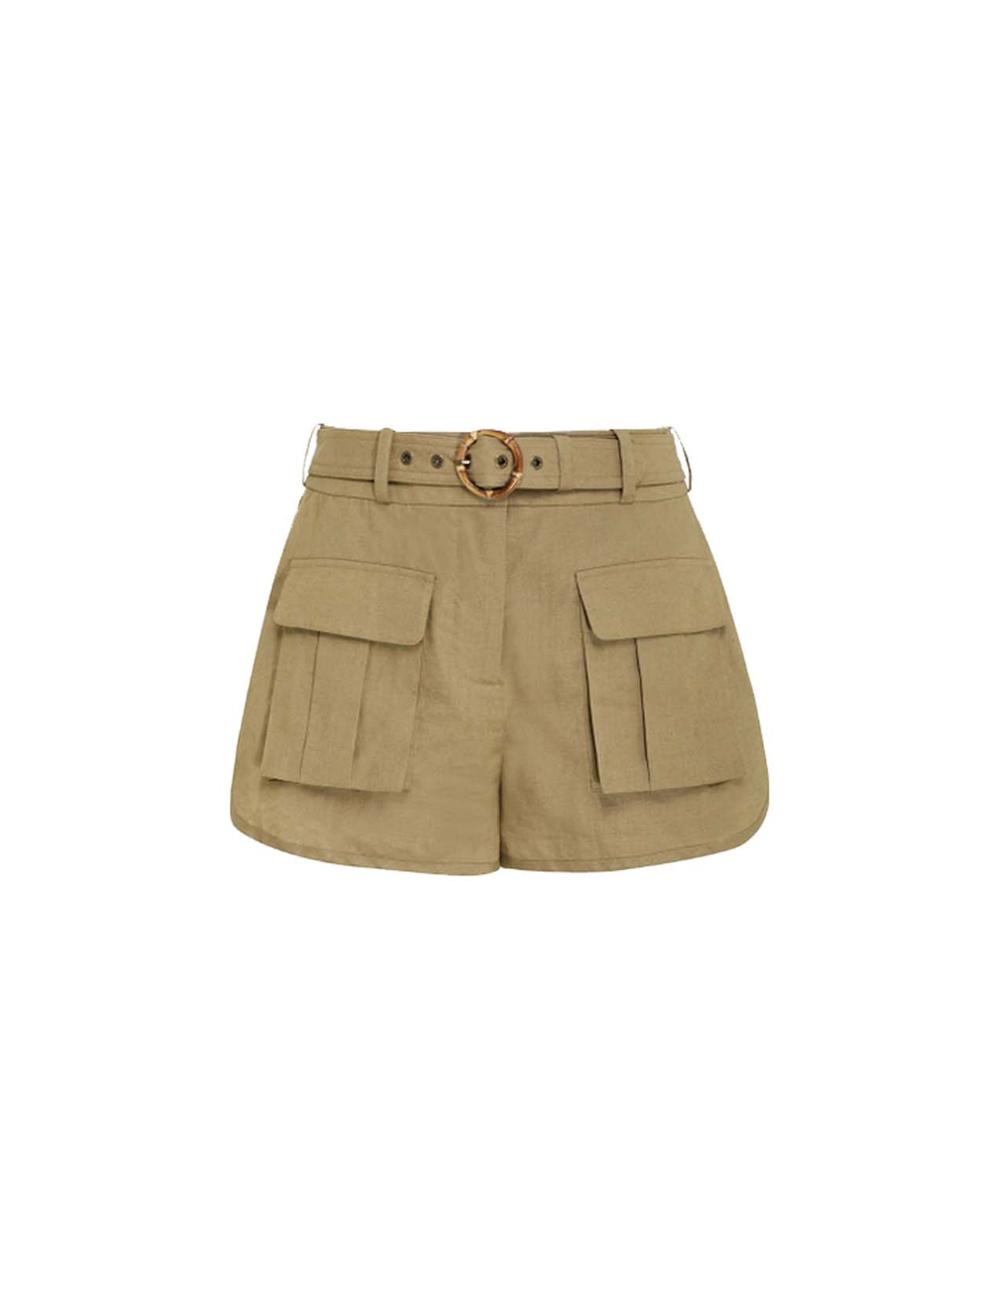 Multi pockets shorts Zimmerman - BIG BOSS MEGEVE